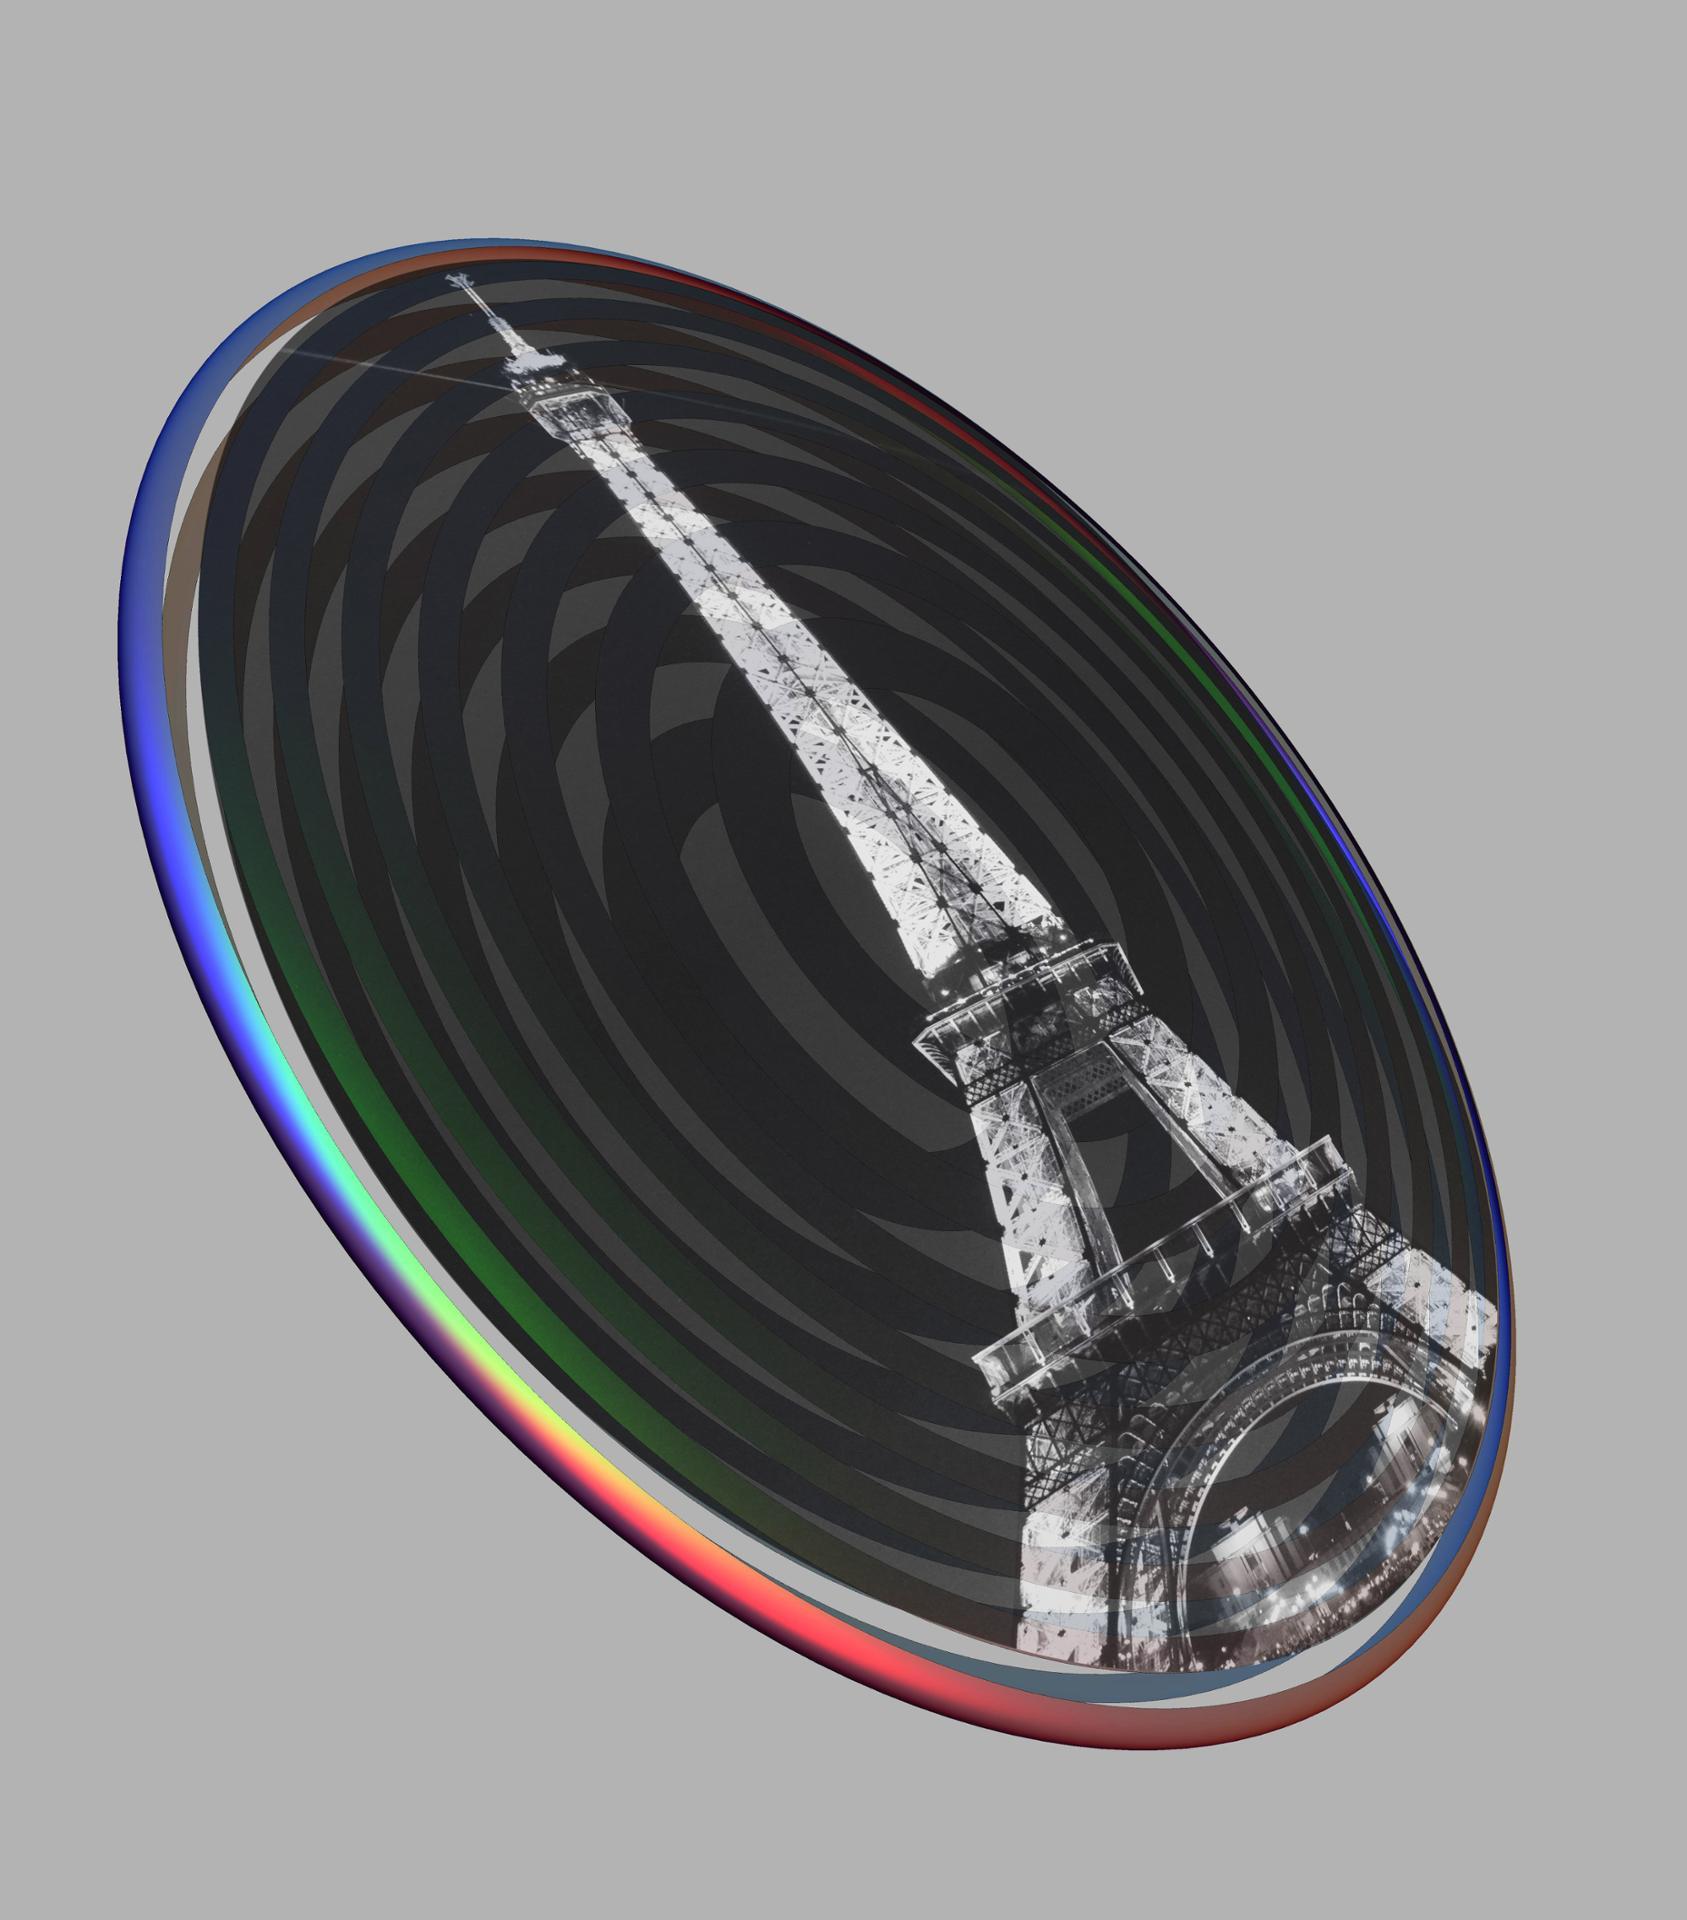 Geometry+Photography+Paris=Badge